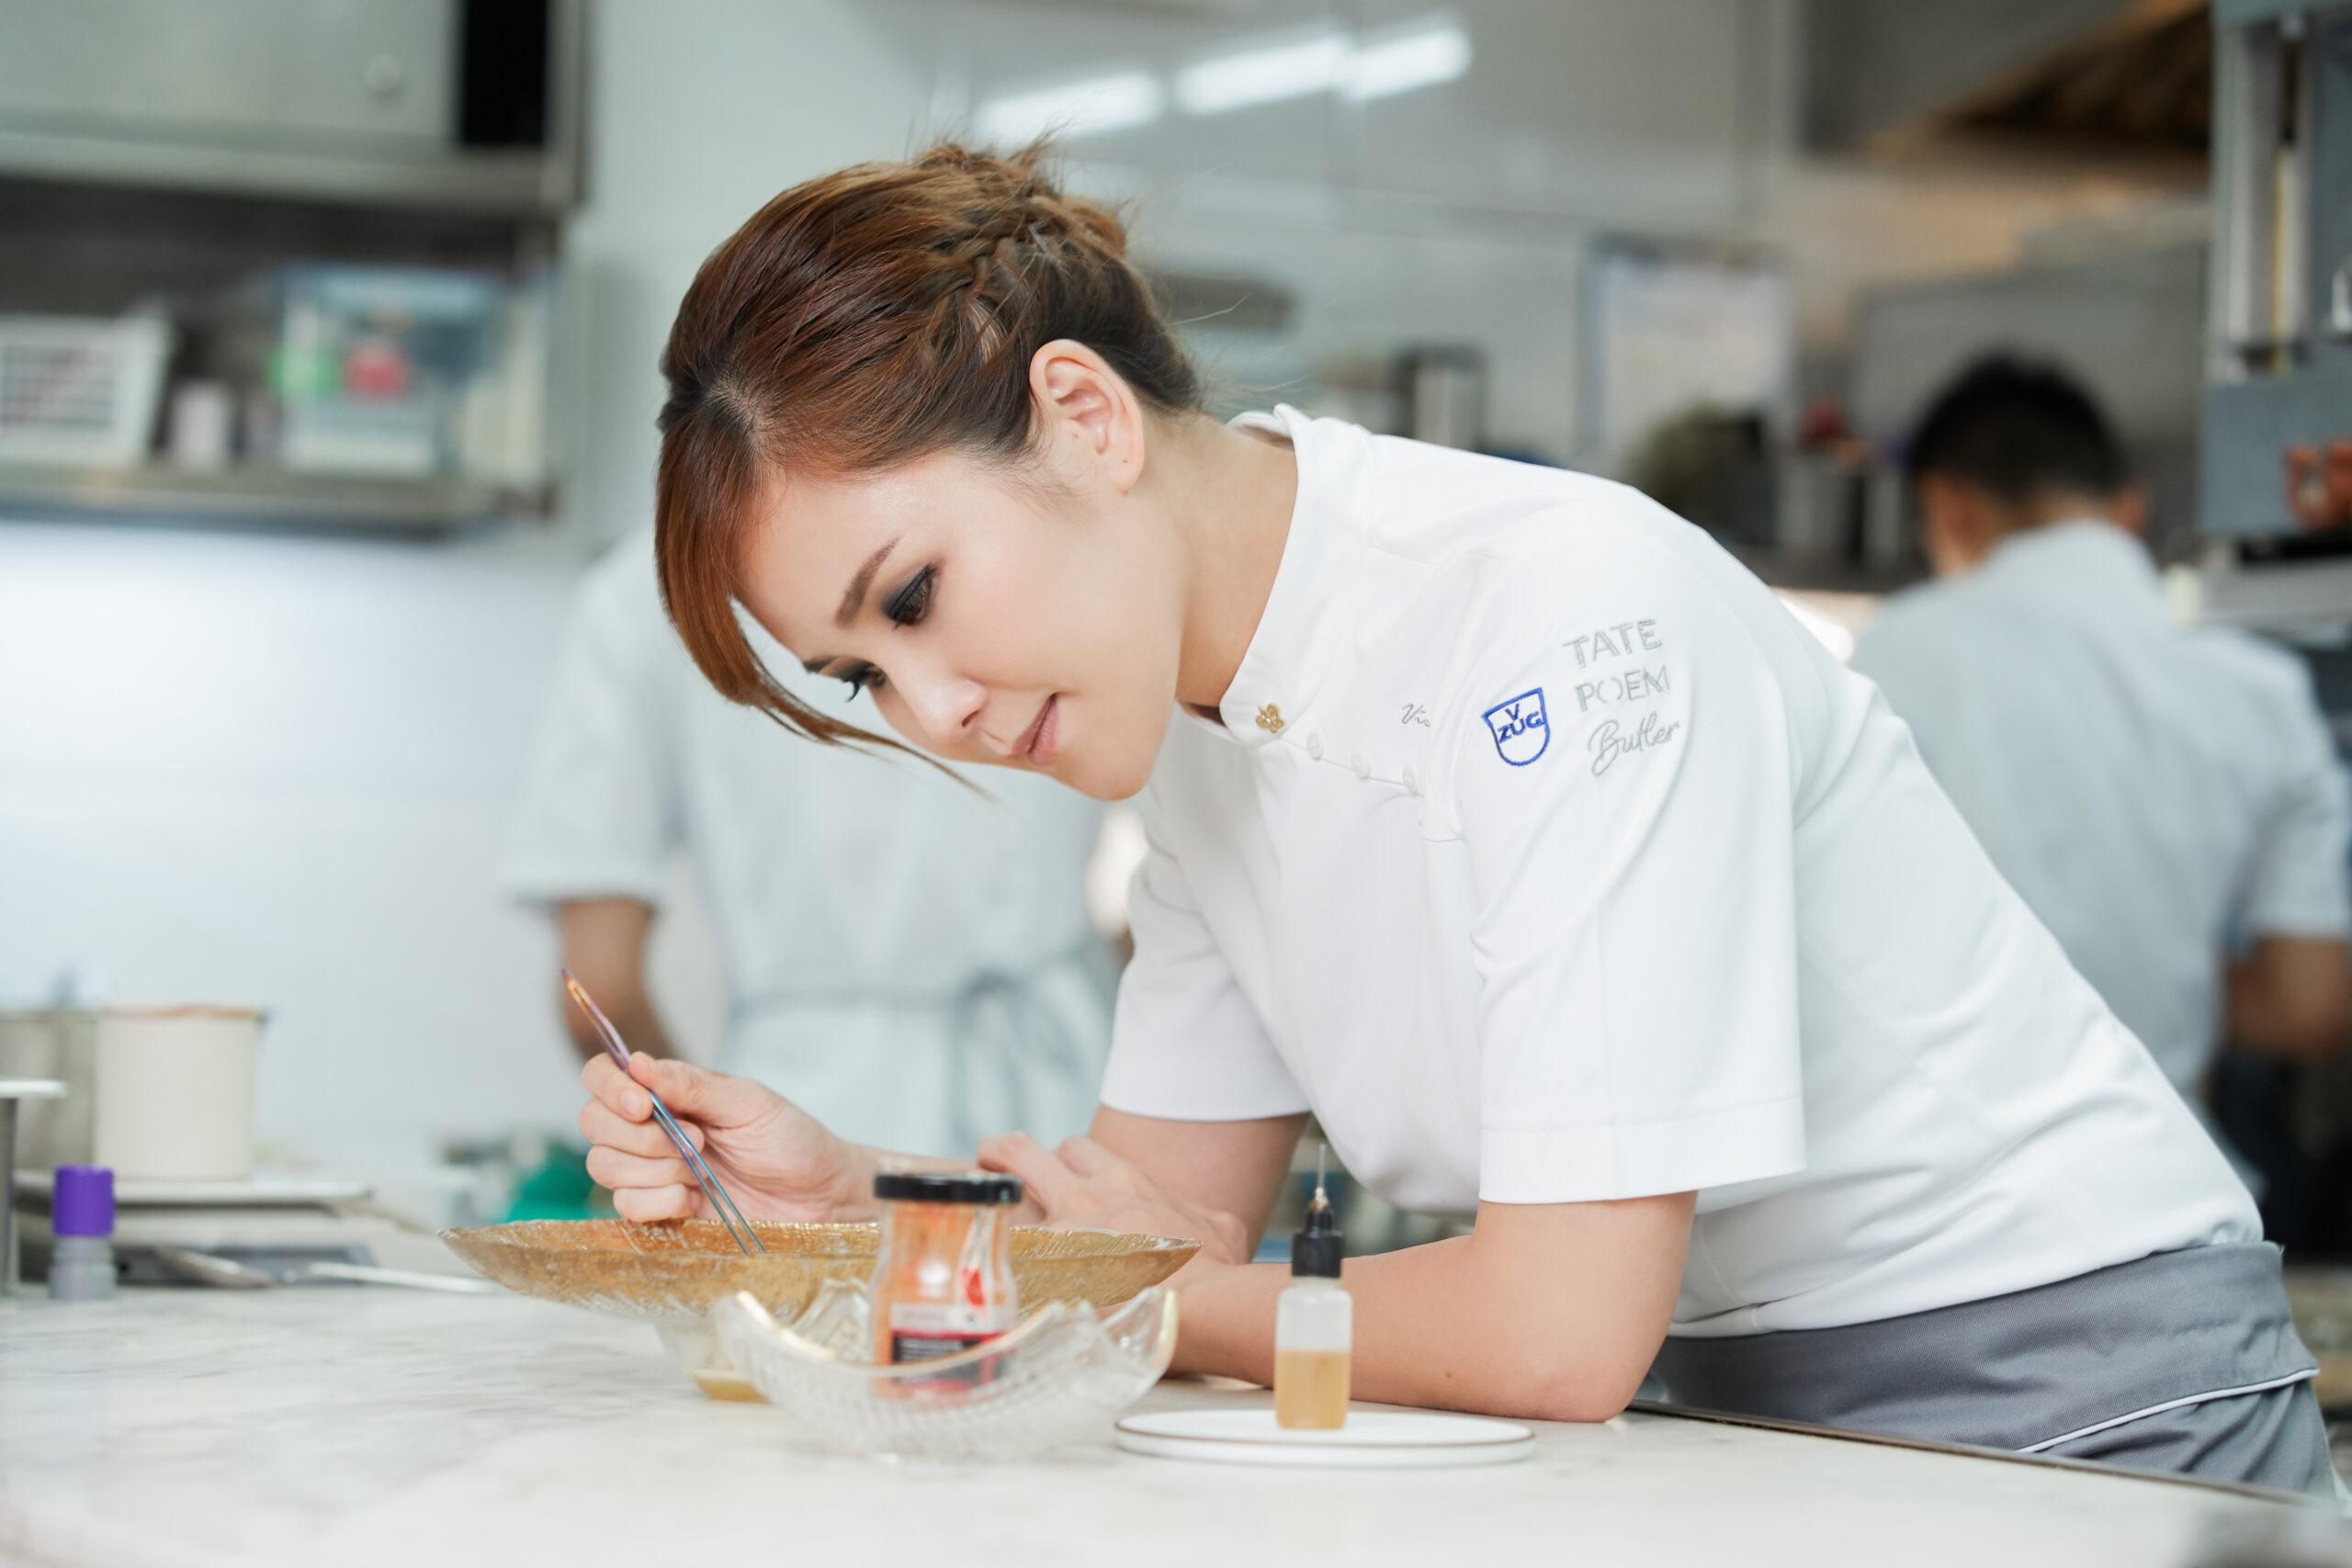 The Loop HK 30 Best Eats 2020 Best Chef: Vicky Lau, Tate Dining Room